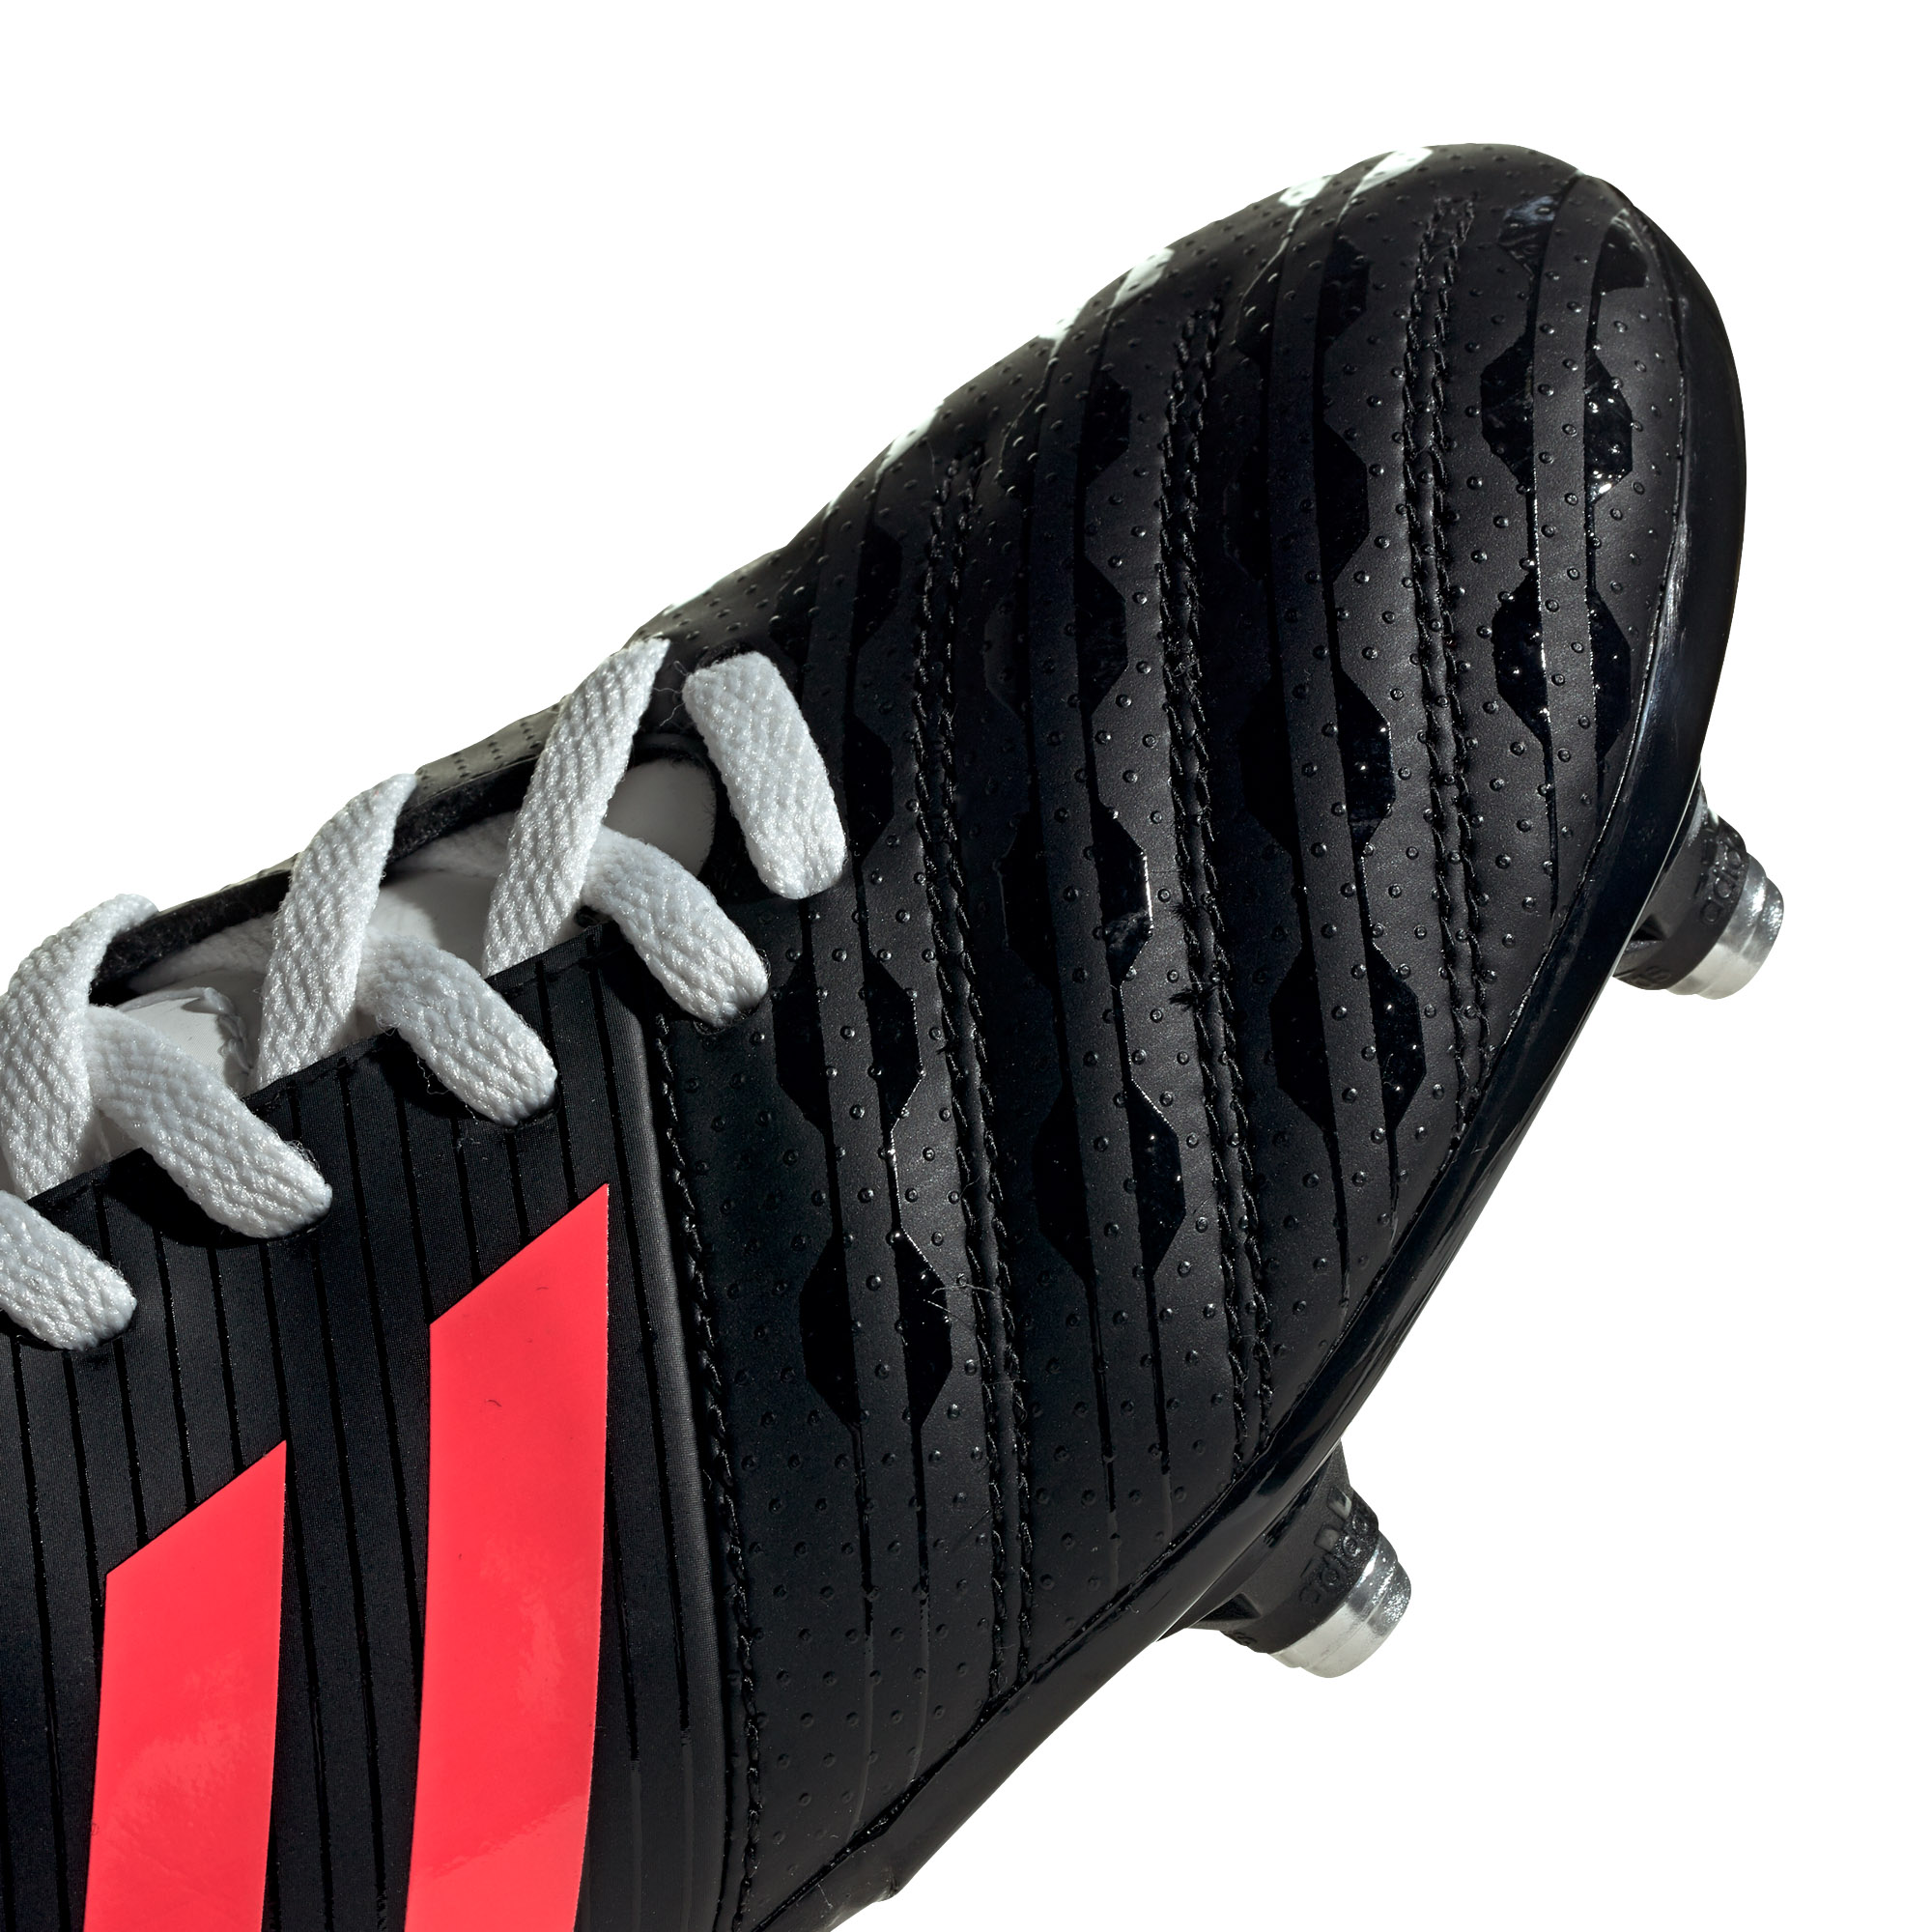 miniature 10 - Adidas Malice SG Terrain Souple Junior Enfants Rugby Boot Noir/Rose